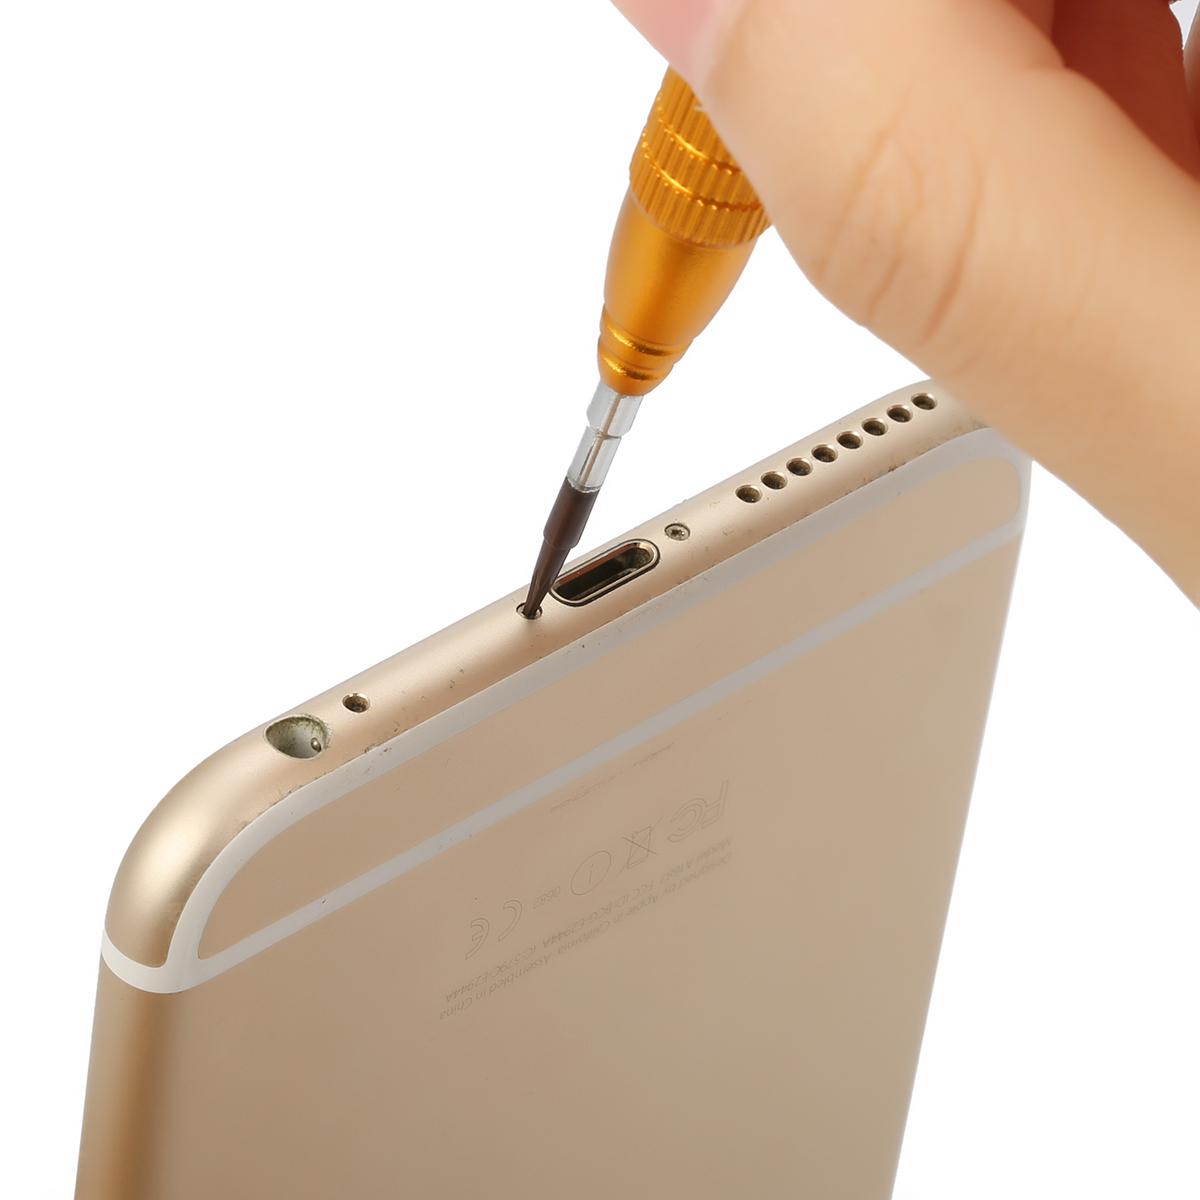 GOCHANGE 84 in 1 Precision Screwdriver Set Magnetic Repair Tool Kit for iPhone Tablet PC MacBook Pad